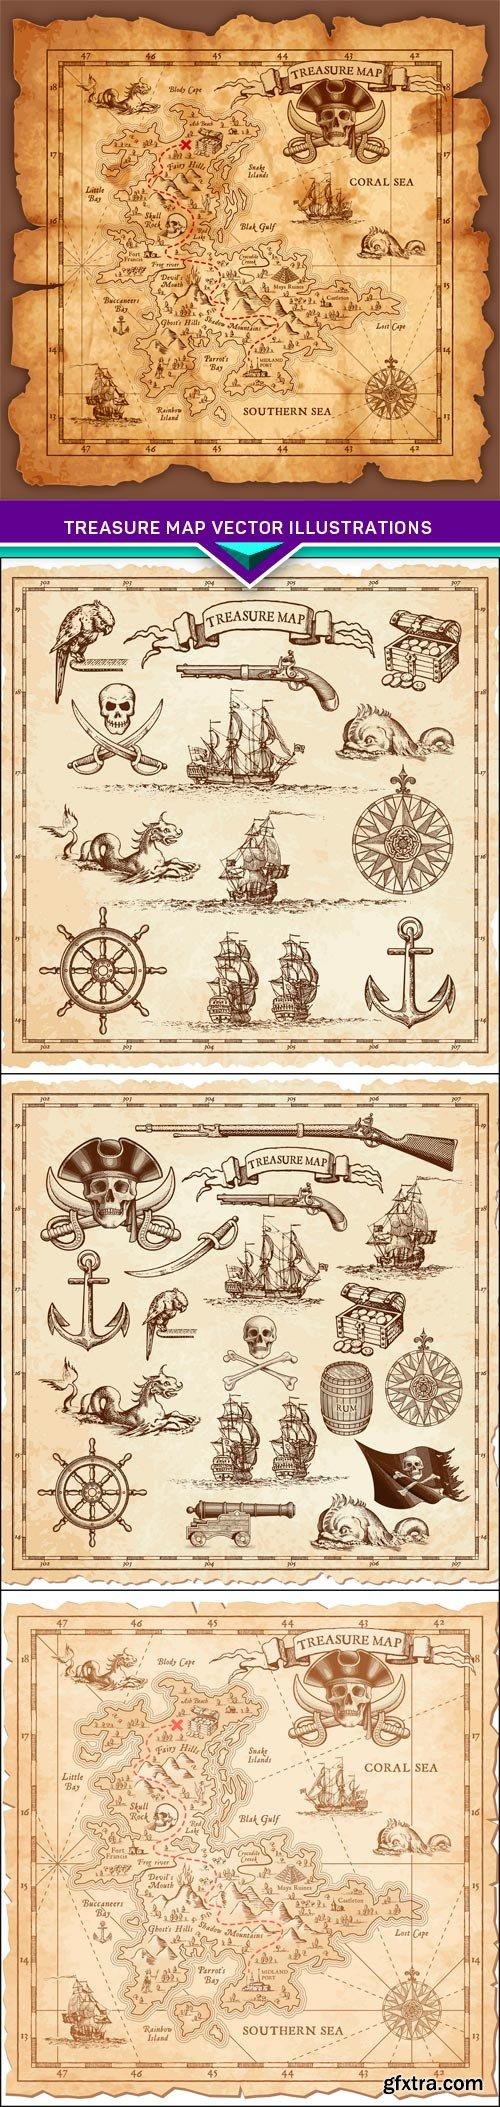 Treasure map vector illustrations 4X EPS